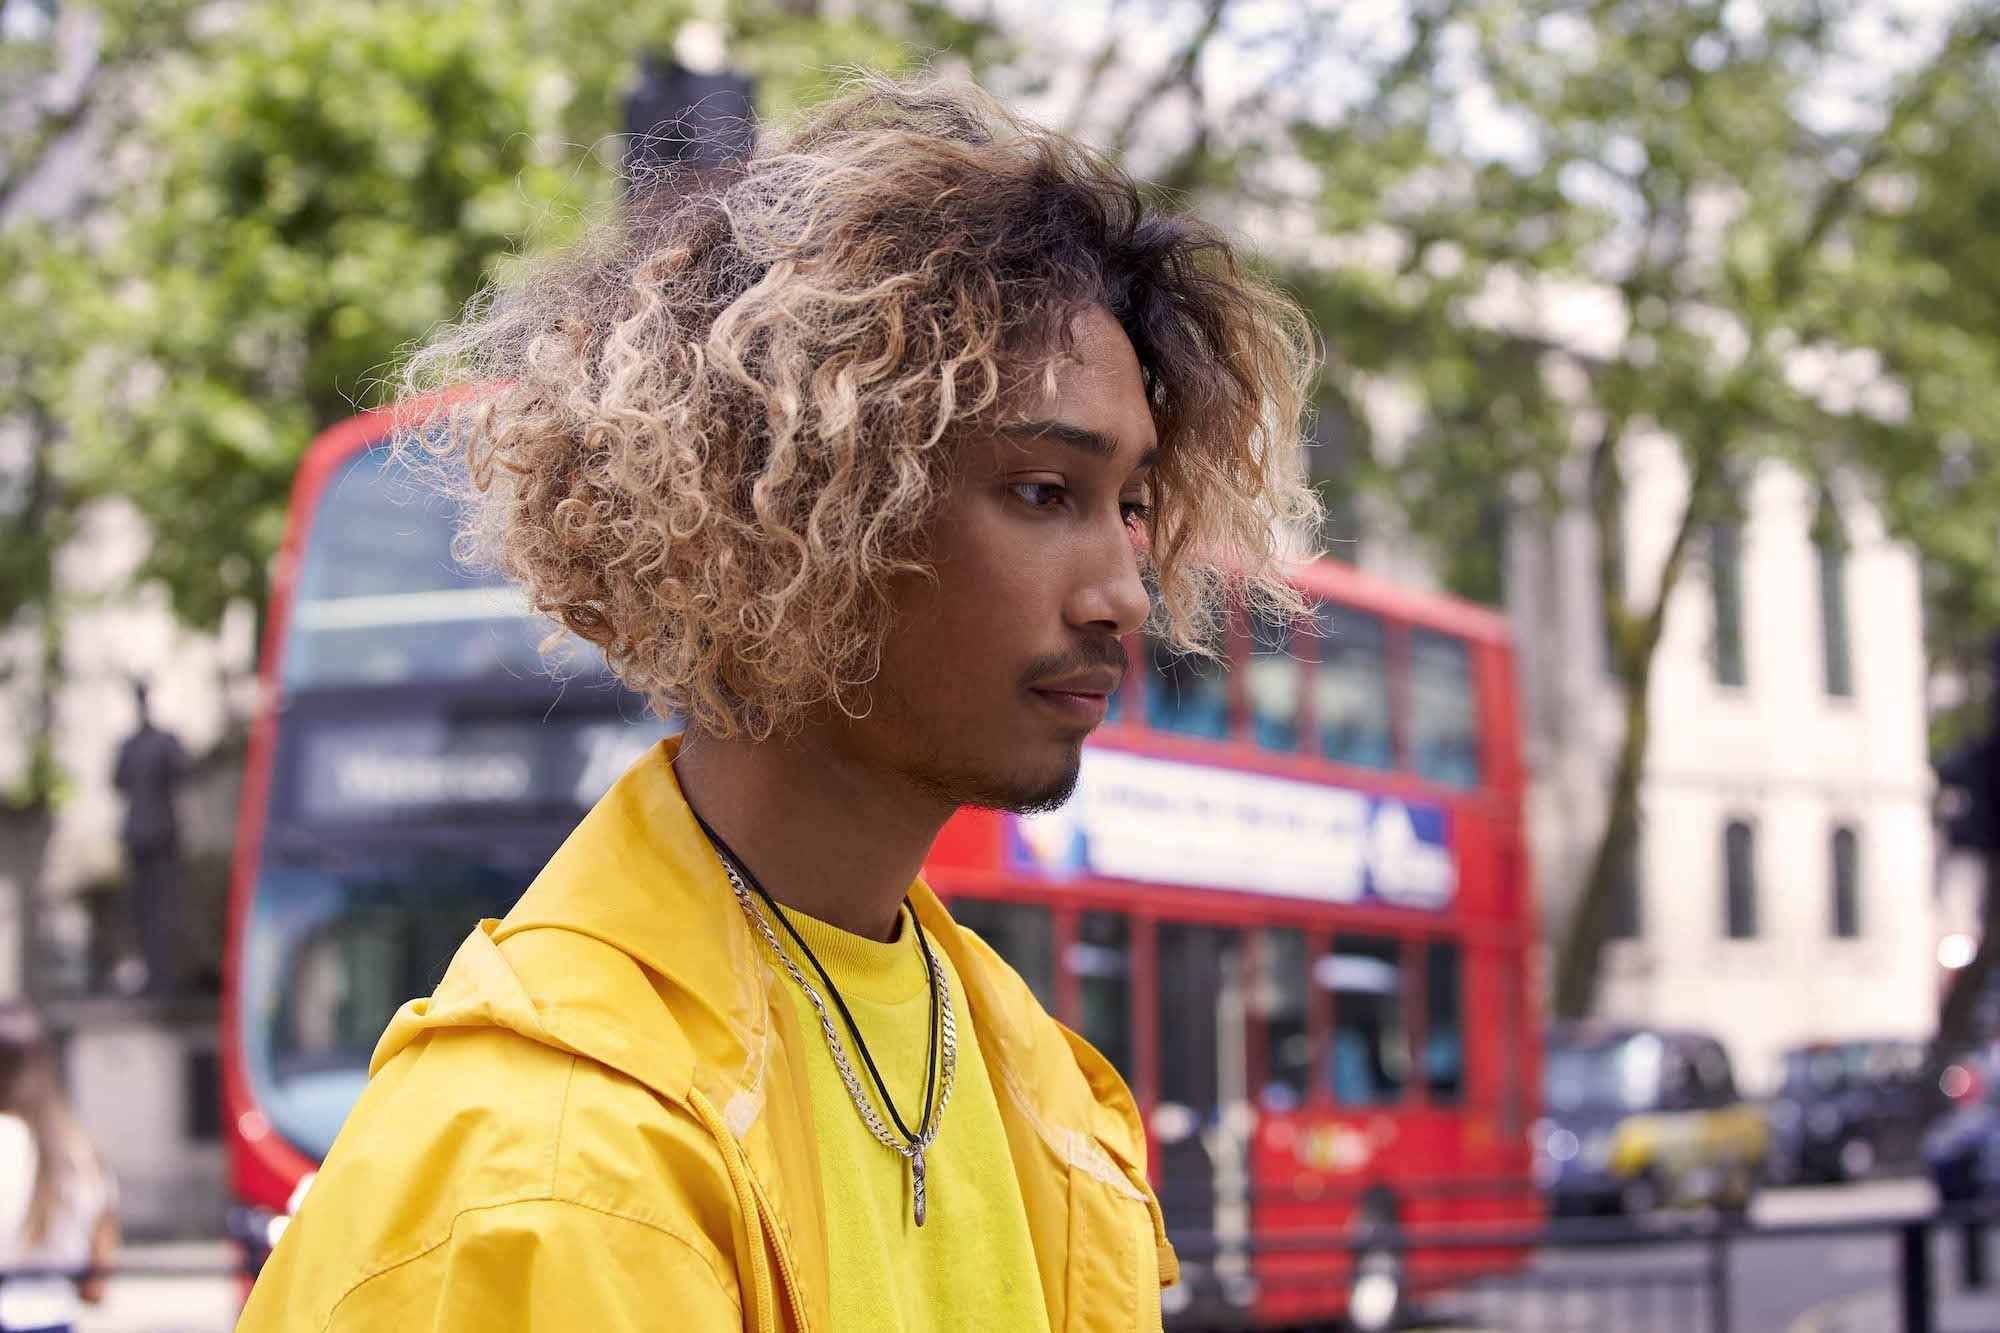 Trend warna rambut pria 2018 warna rambut ombre pirang.